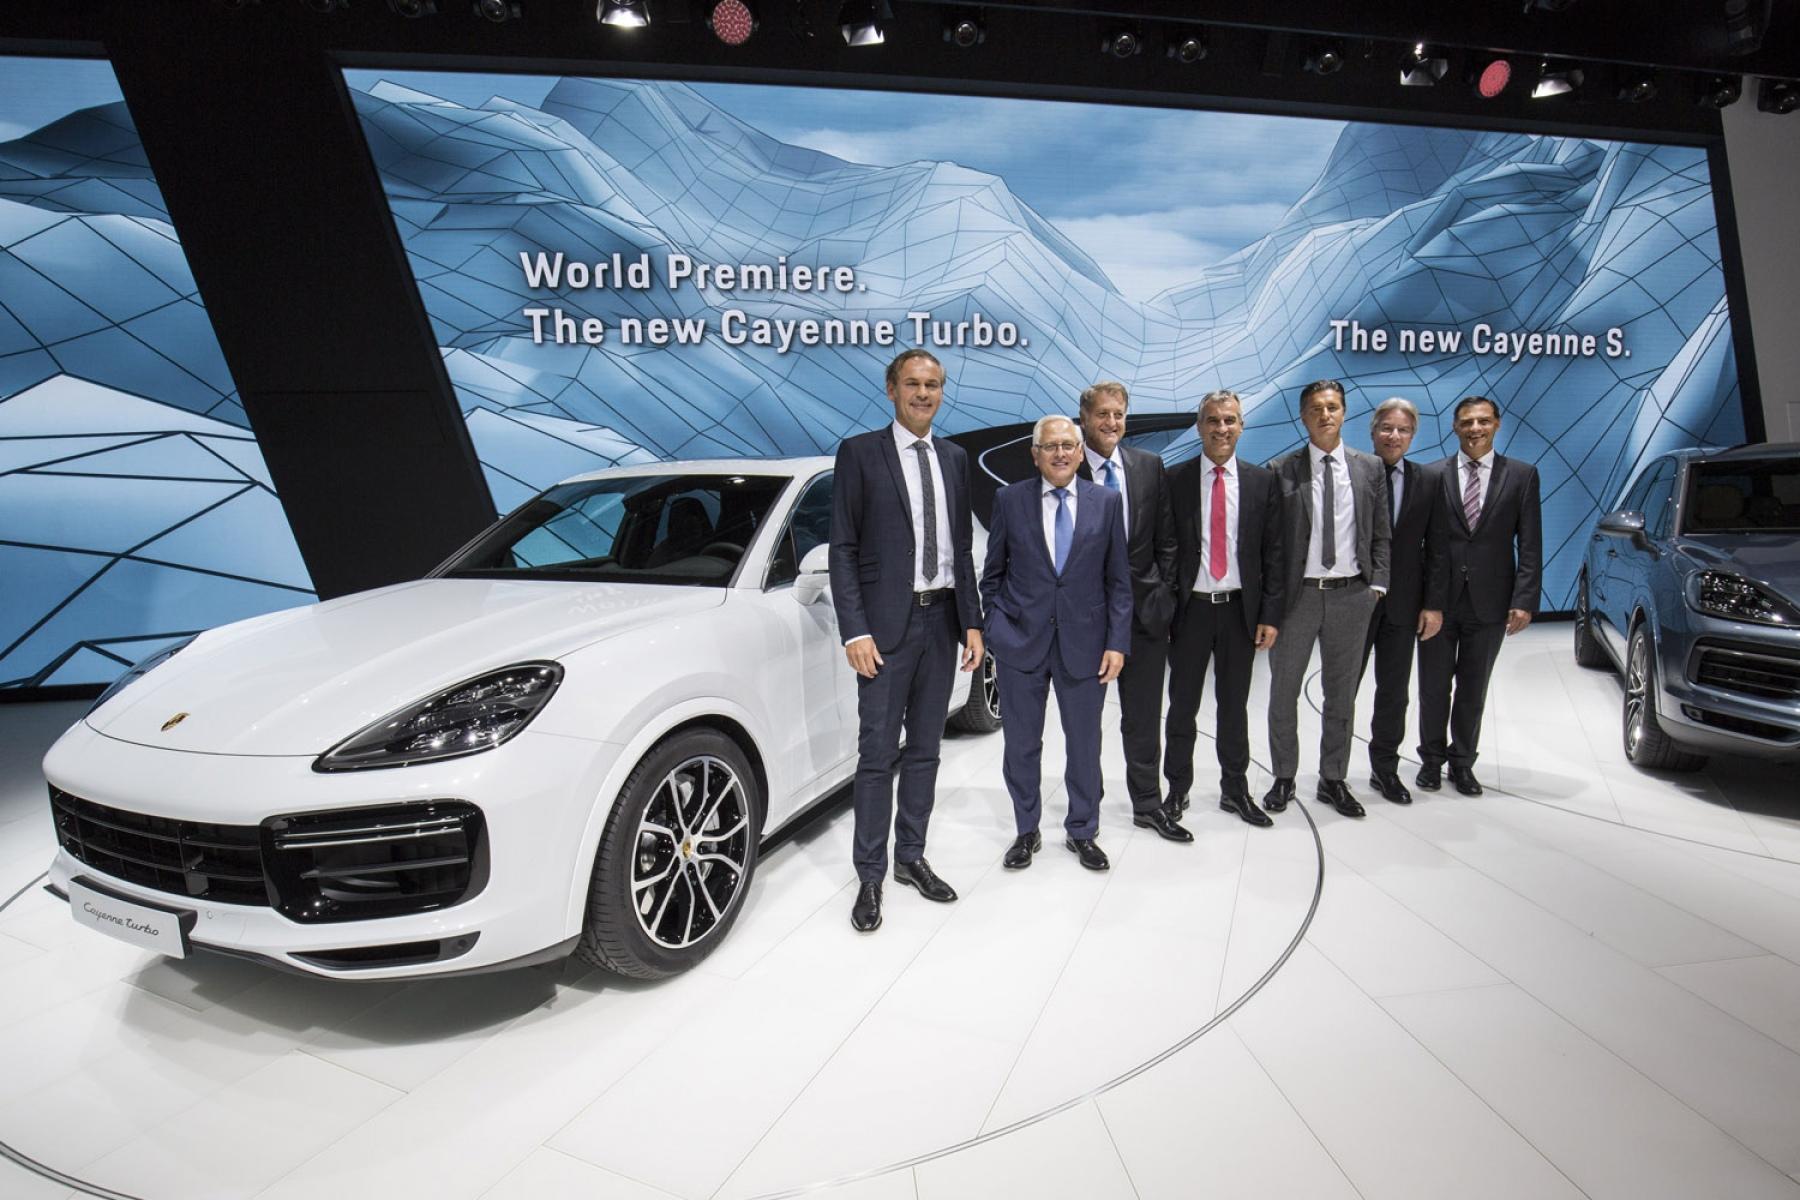 world premiere of the new cayenne turbo iaa 2017のポルシェ